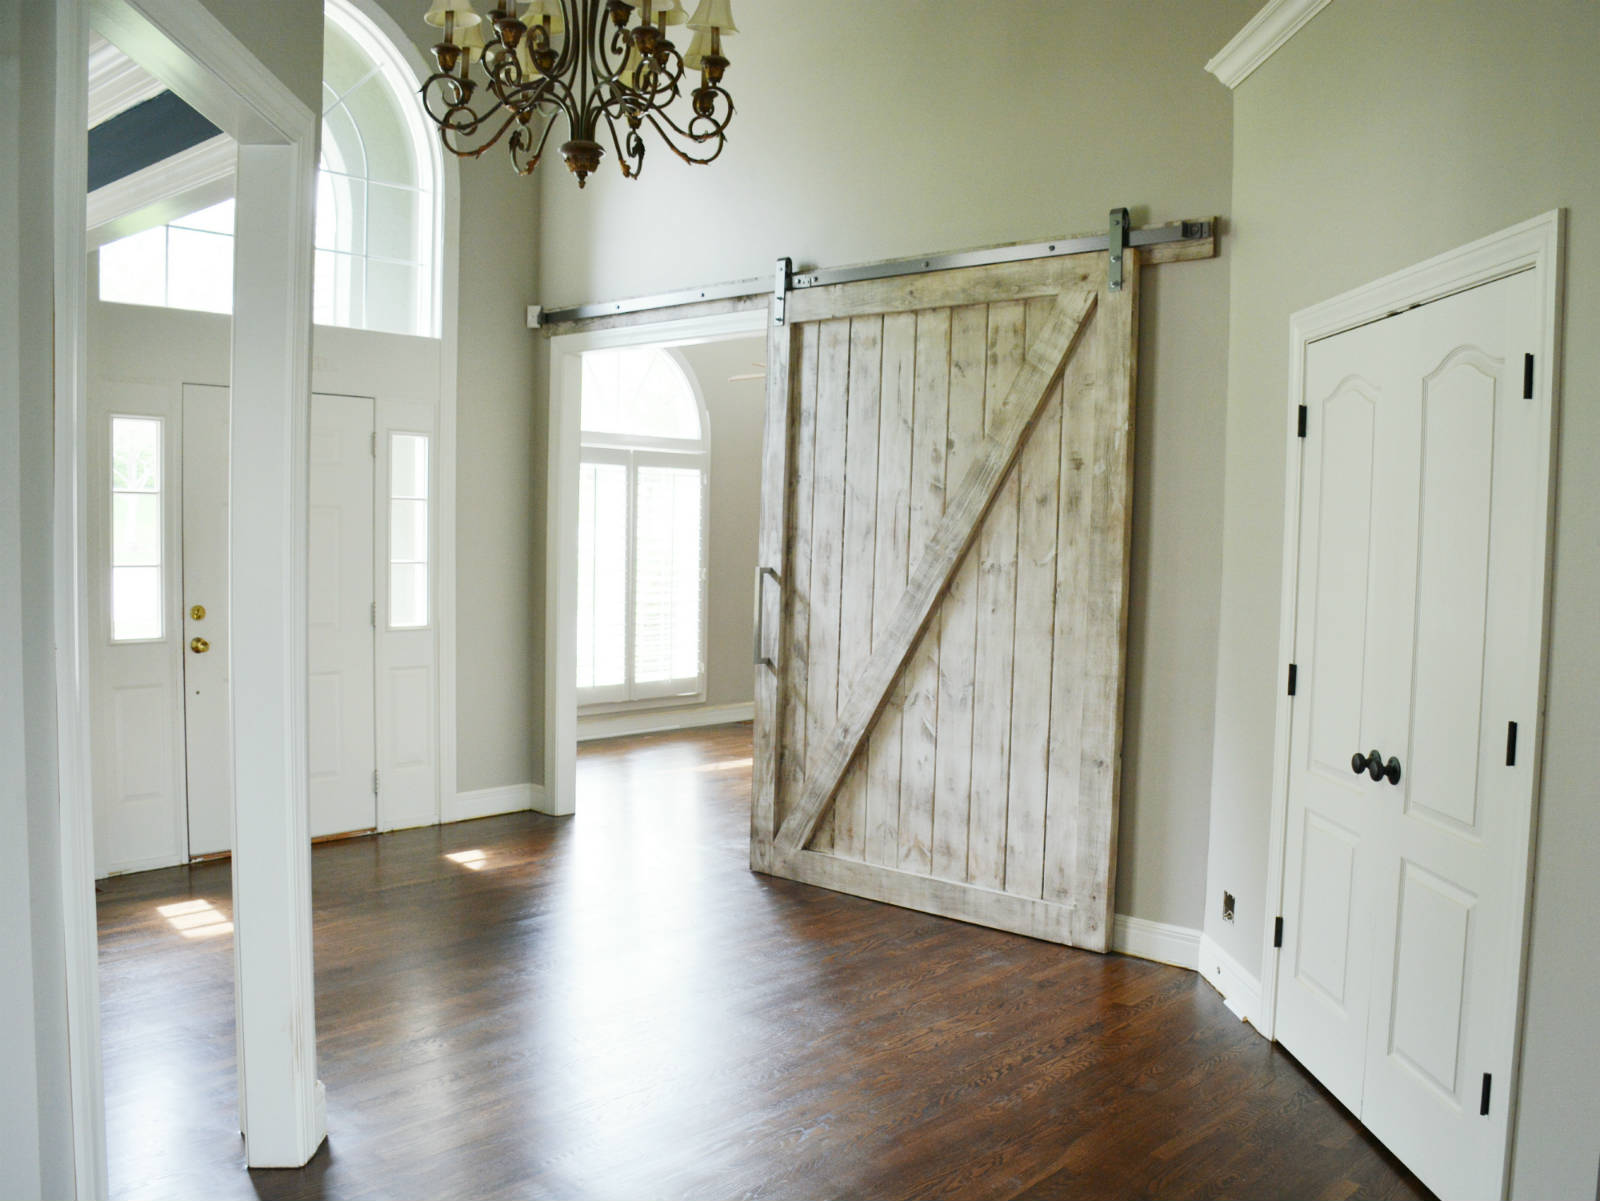 Sliding Door Hardware in Entry